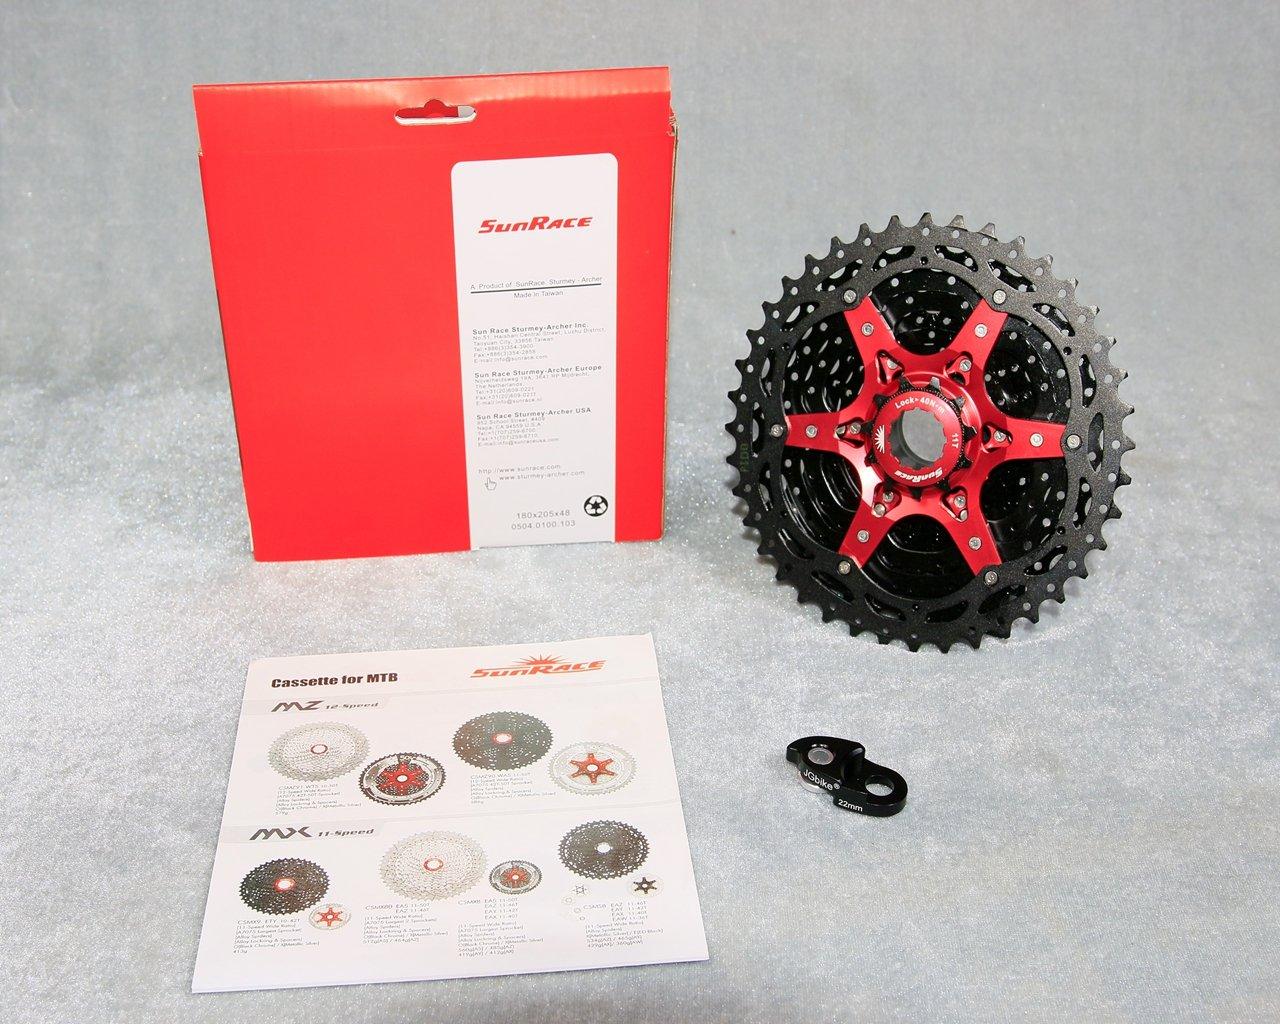 JGbike Sunrace 10 Speed Cassette 11-40T CSMX3 Black Wide Ratio MTB Cassette for Mountain Bike Including Extender